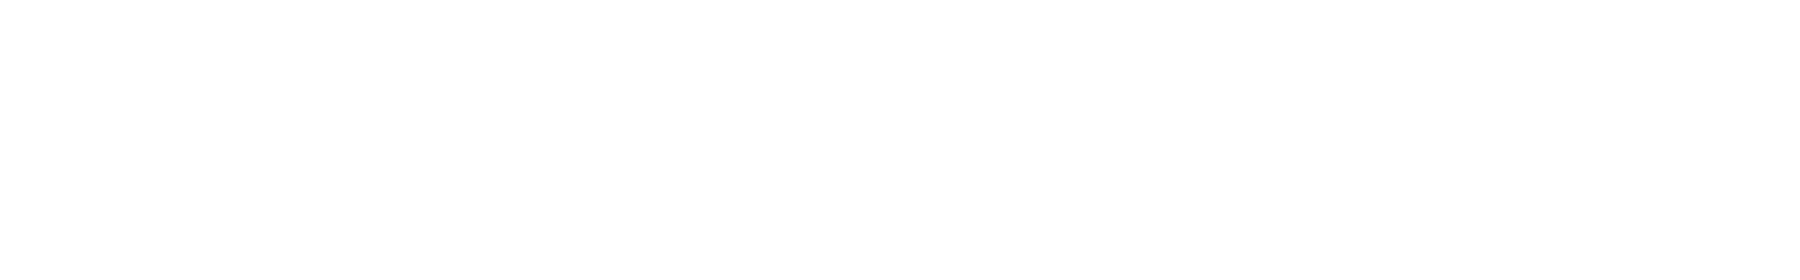 electrotechnobeatgc